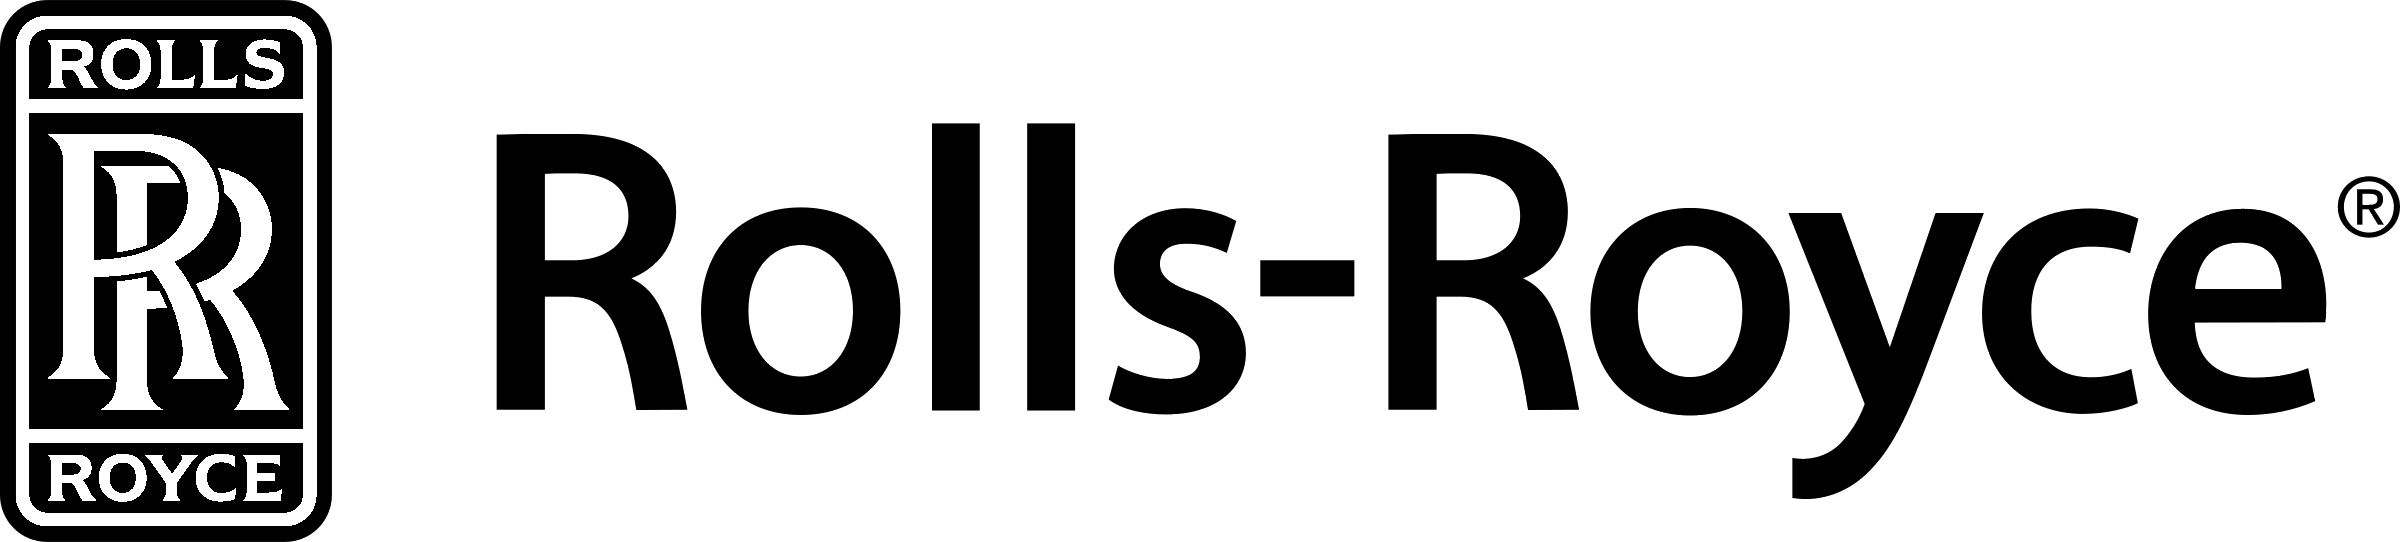 rolls-royce-2-logo-black-and-white